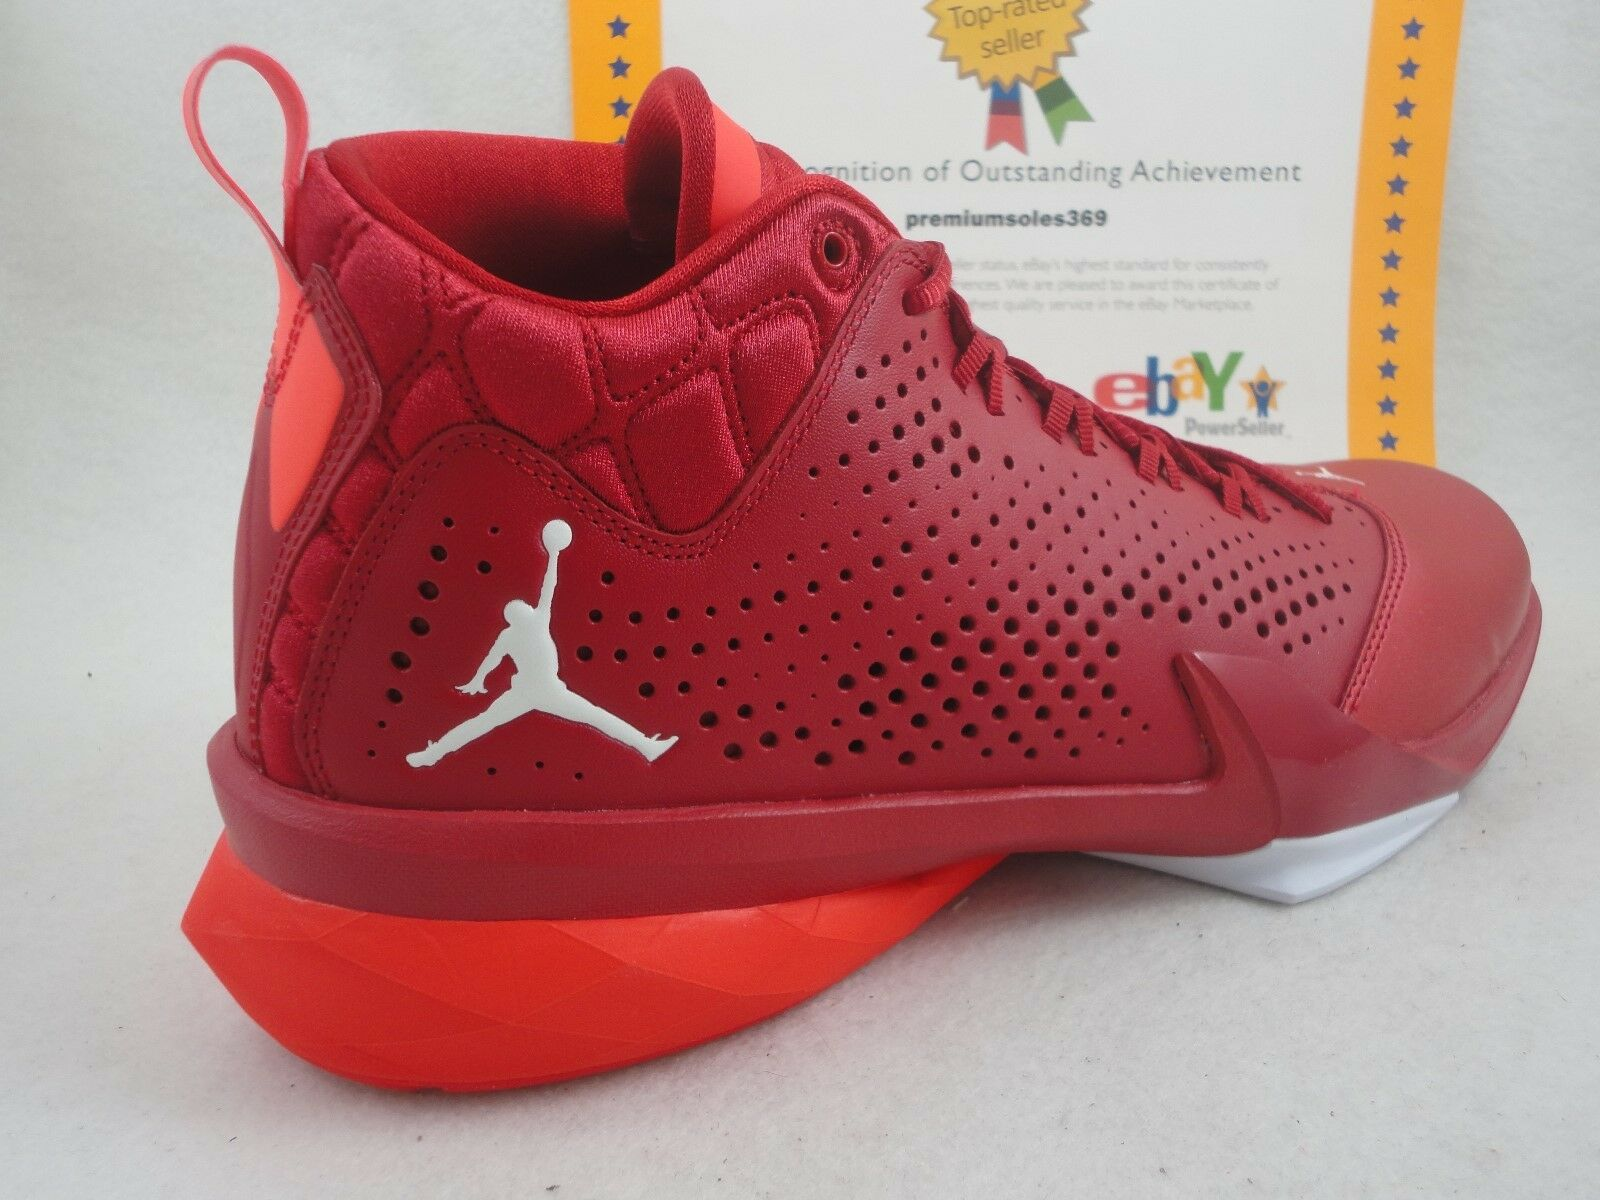 Nike Jordan Flight Time 14,5, gimnasio Rojo / blanco 23 / infrarrojo Lunarlon, tamaño 23 blanco 401c14